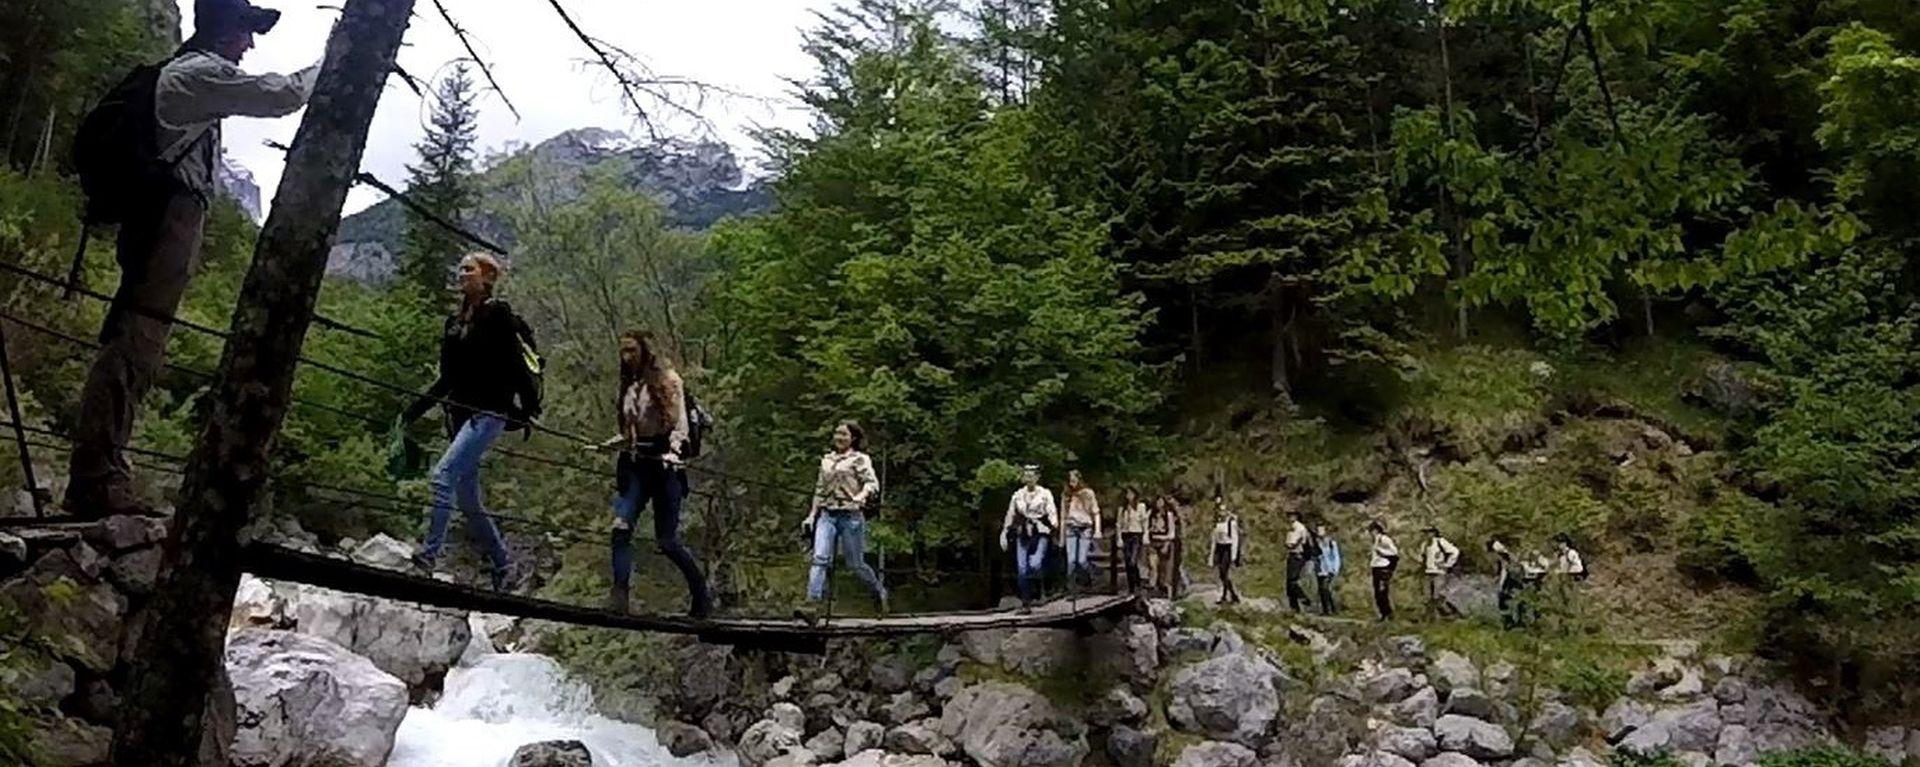 Abenteuer in Slowenien